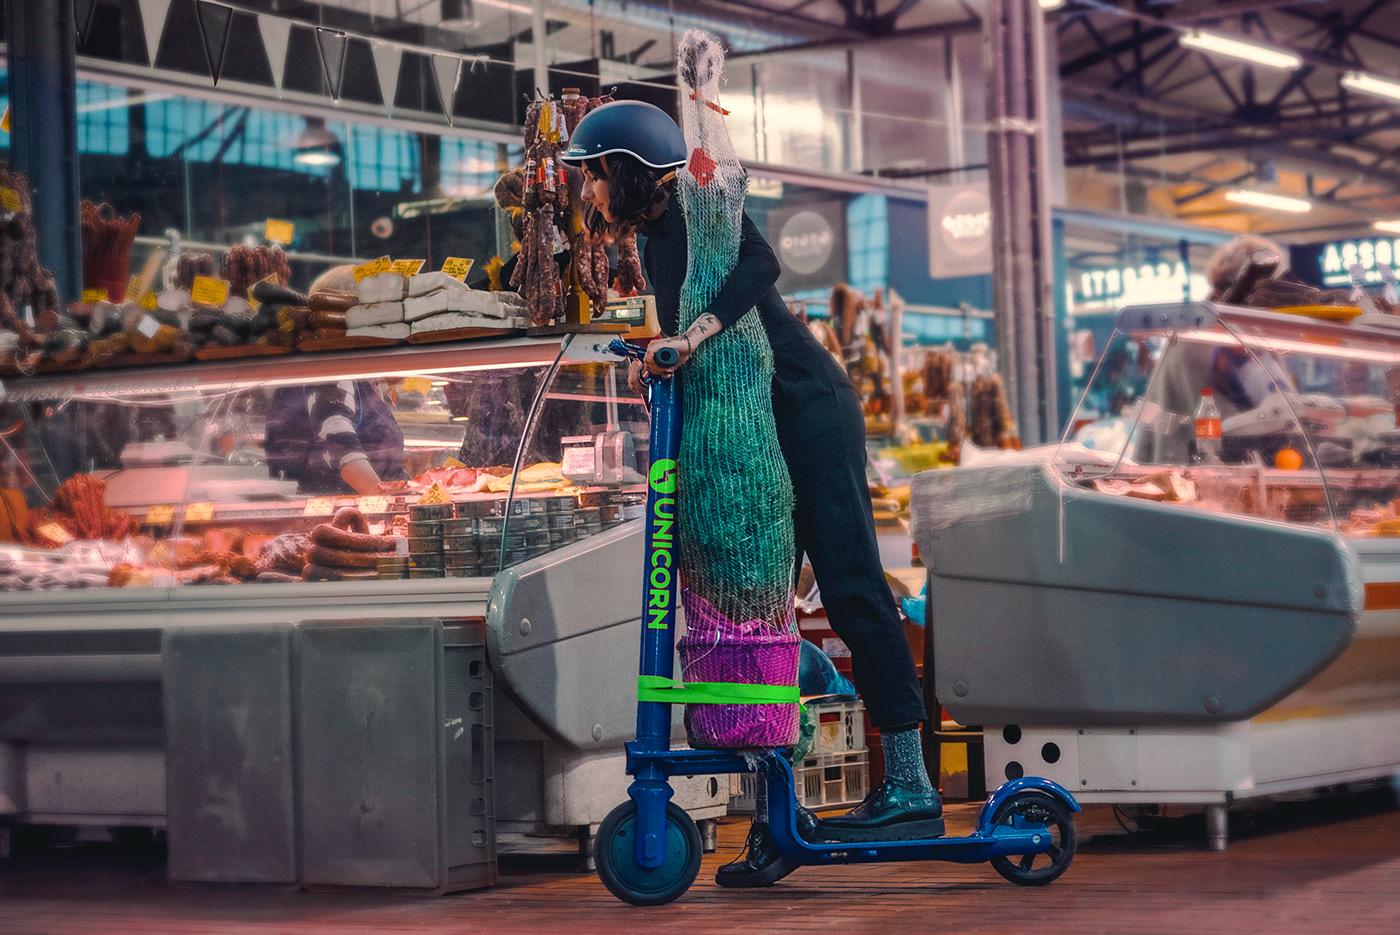 Scooter electricscooter KickScooter Escooter mobility transportation Ecology branding  unicorn productdesign